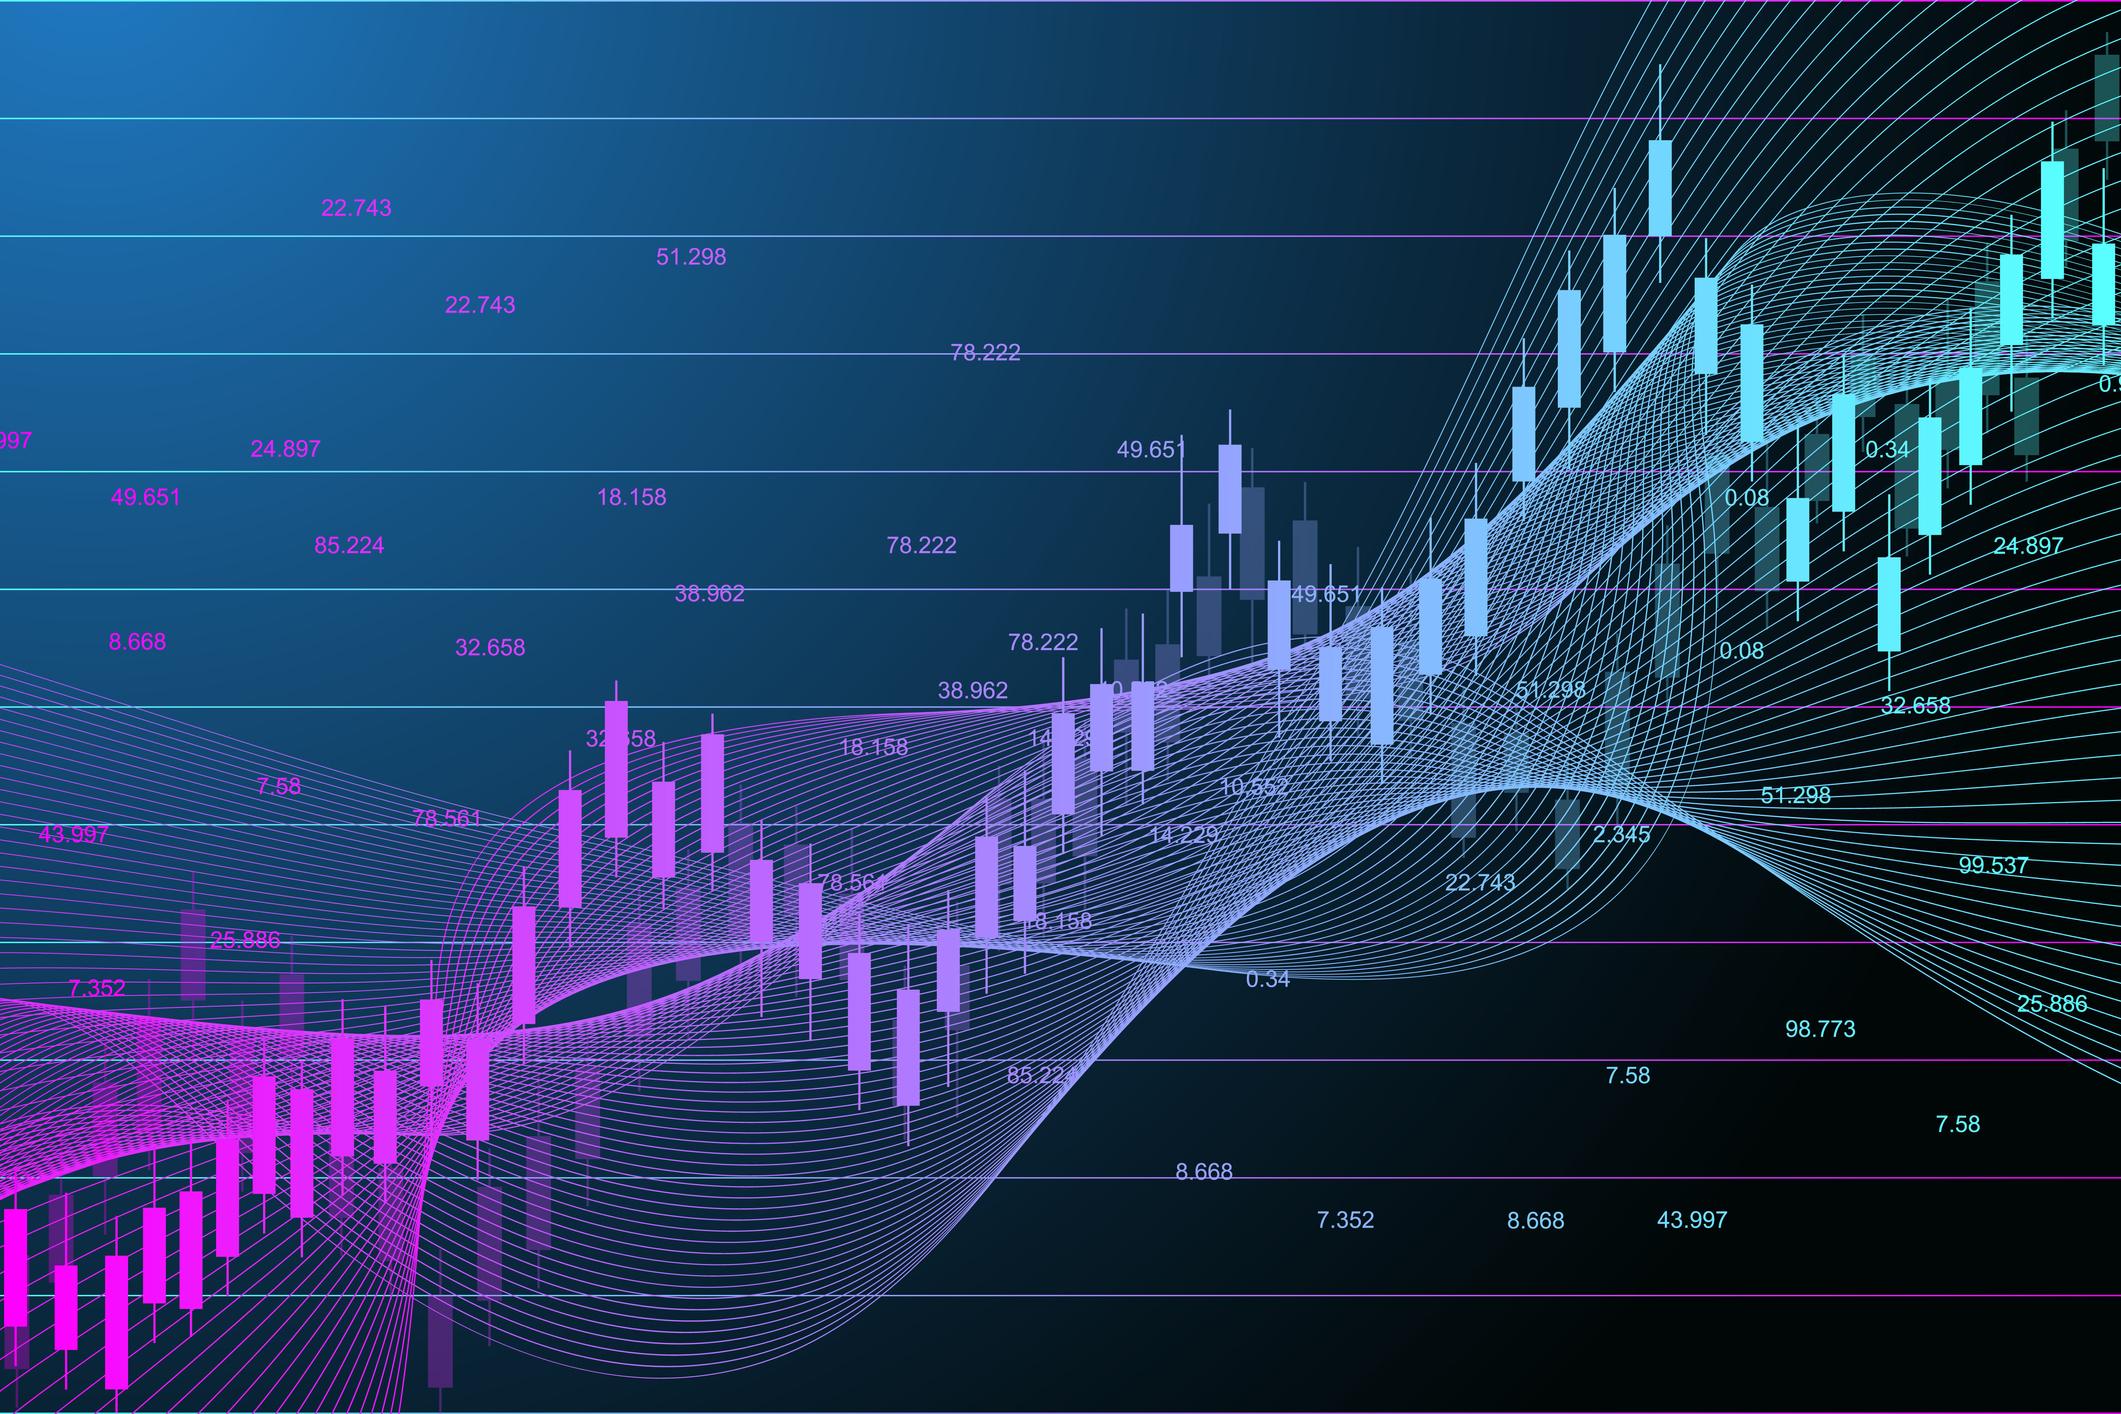 Why Digital Turbine Stock Jumped 44% Last Month